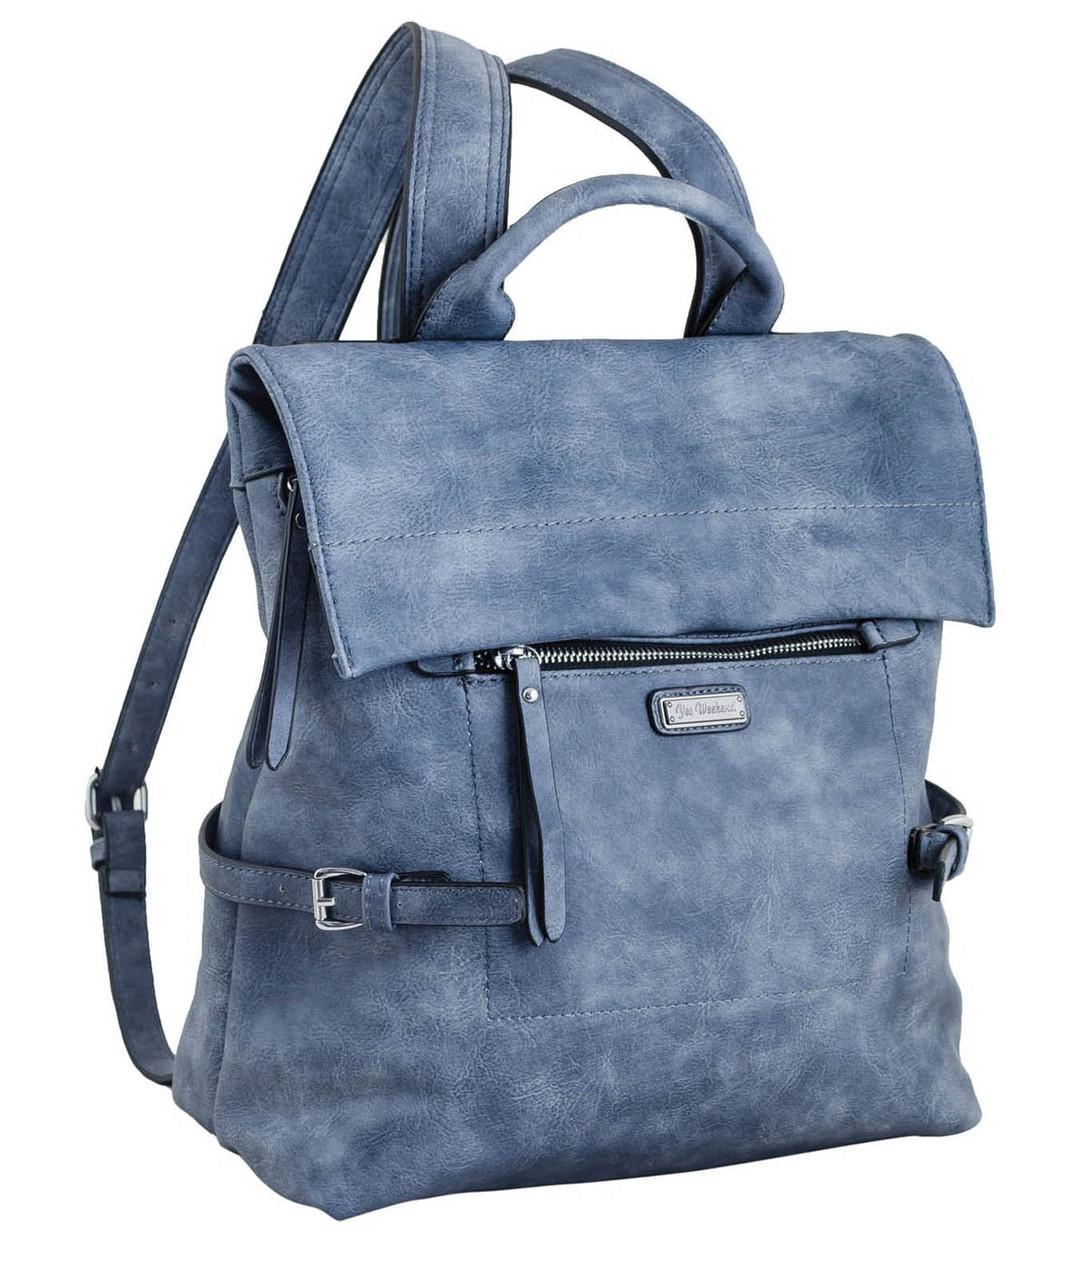 1d94b7b4206c Женская сумка-рюкзак из экокожи 1 ВЕРЕСНЯ, 553218 синий 11 л ...